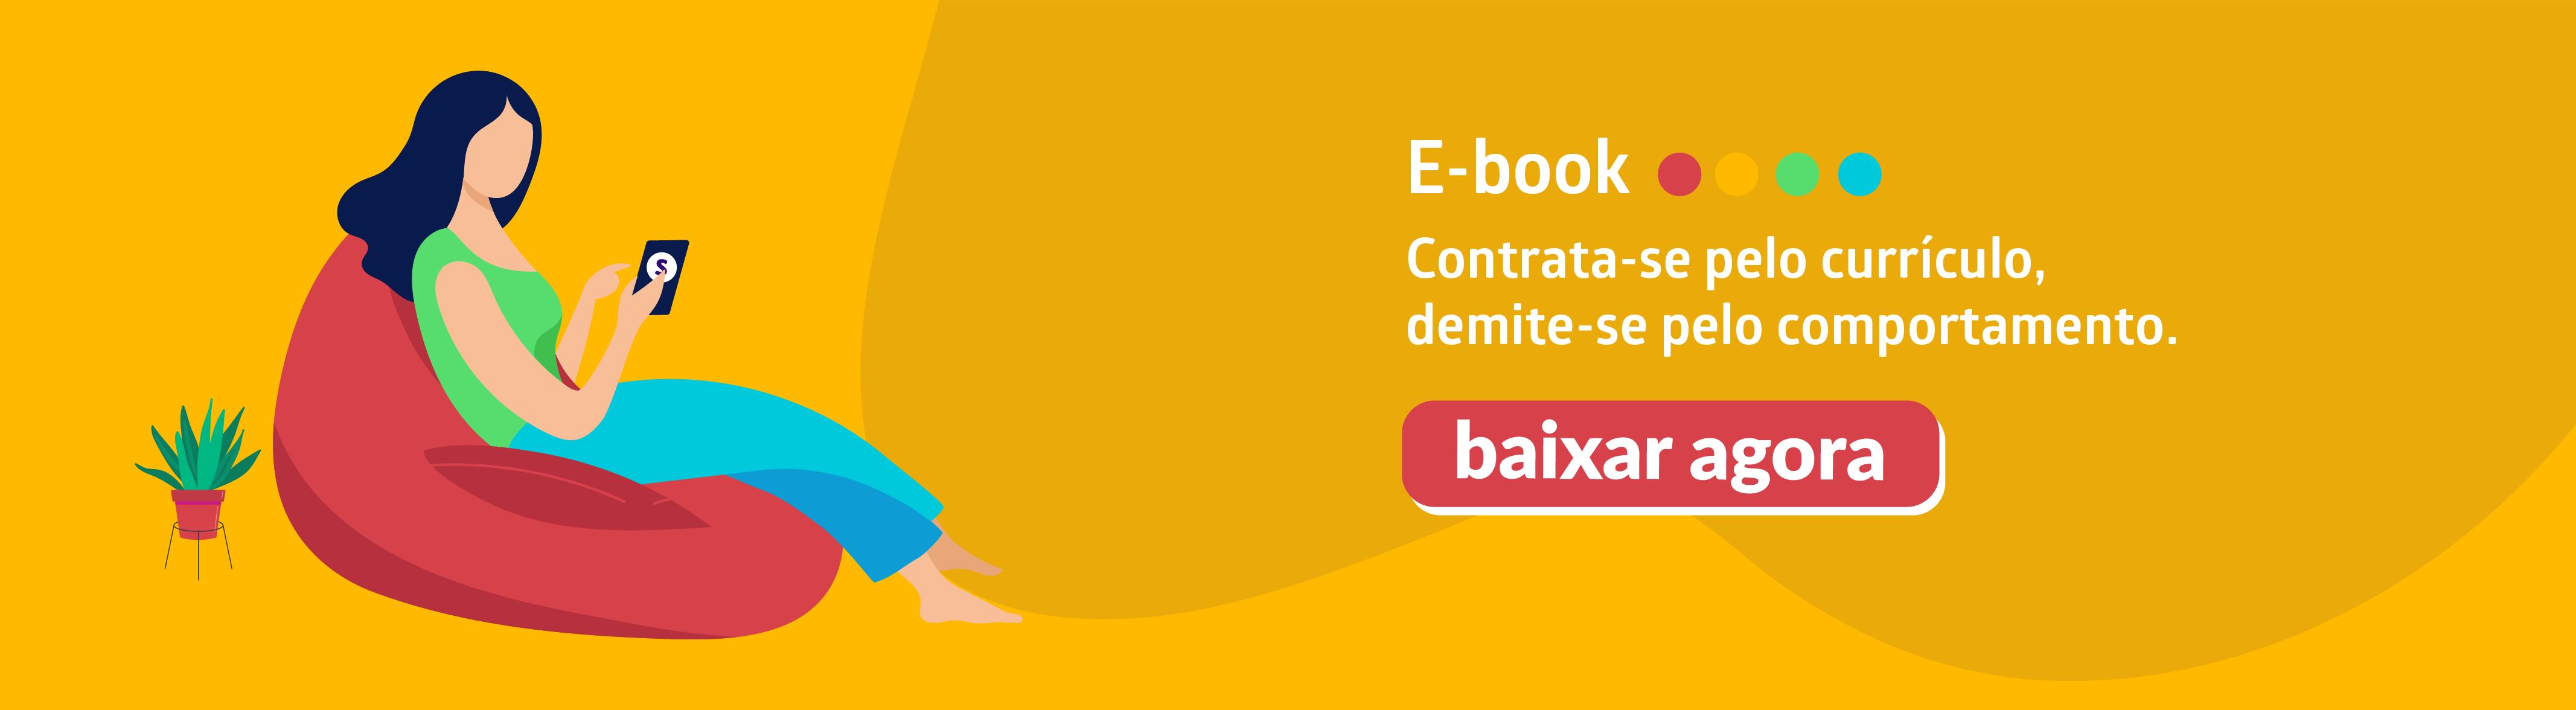 Banner_Contrata-se_pelo_curriculo_demite-se_pelo_comportamento